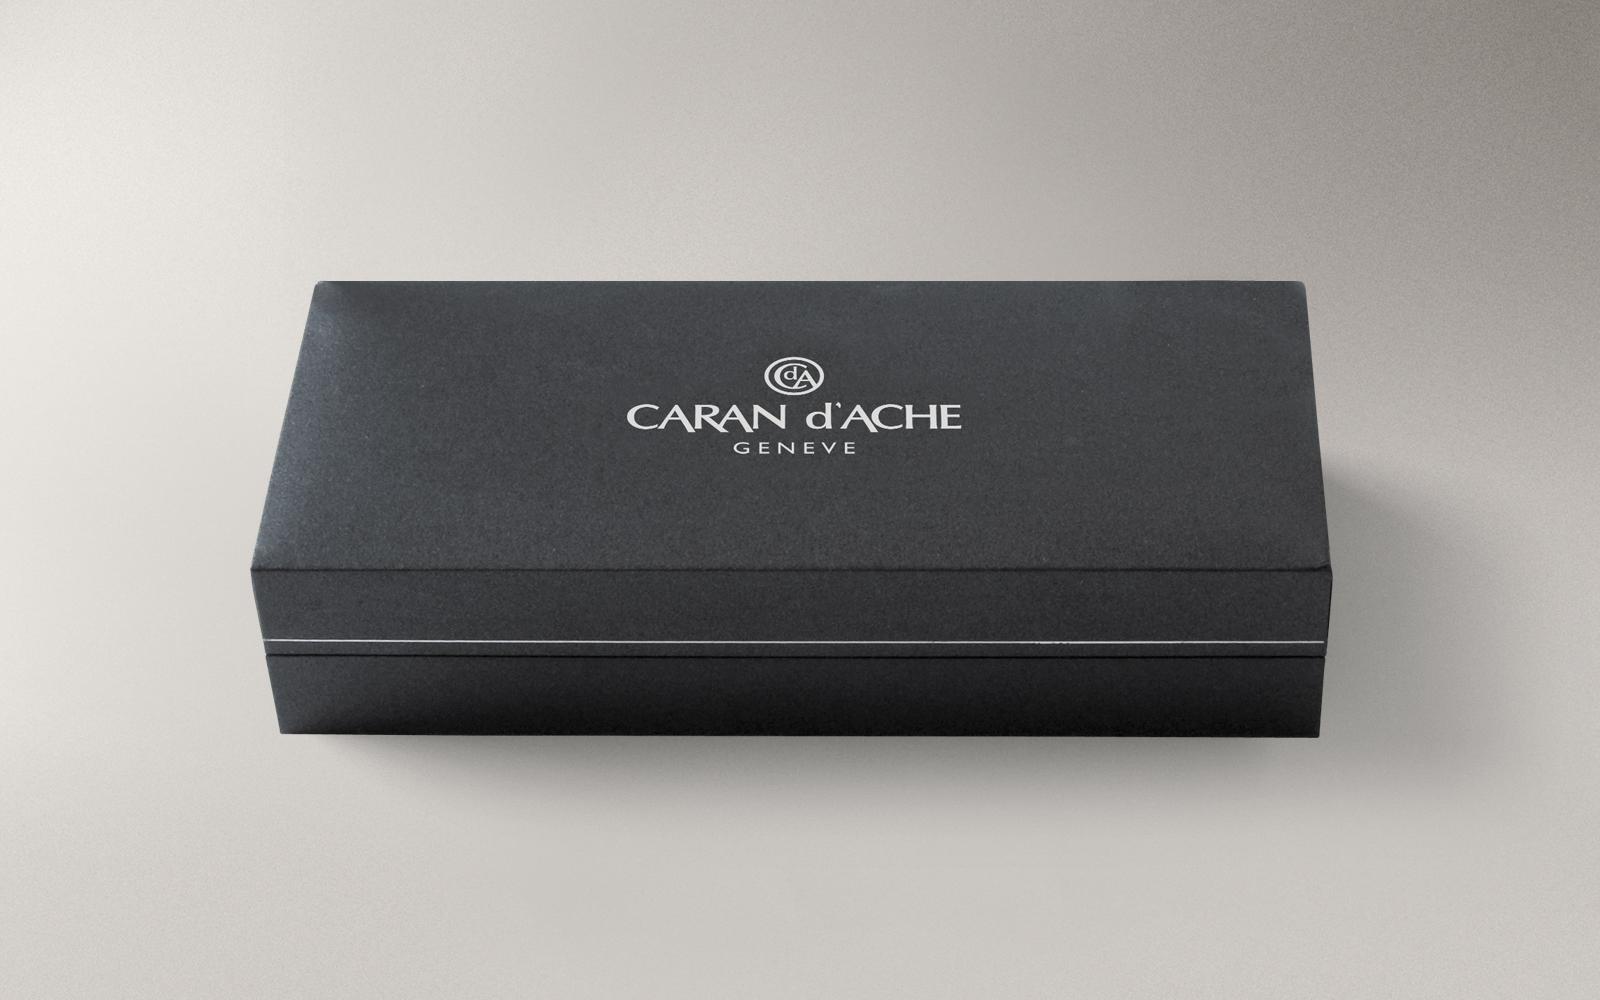 Carandache Leman - Scarlet Red Lacquer SP, шариковая ручка, F